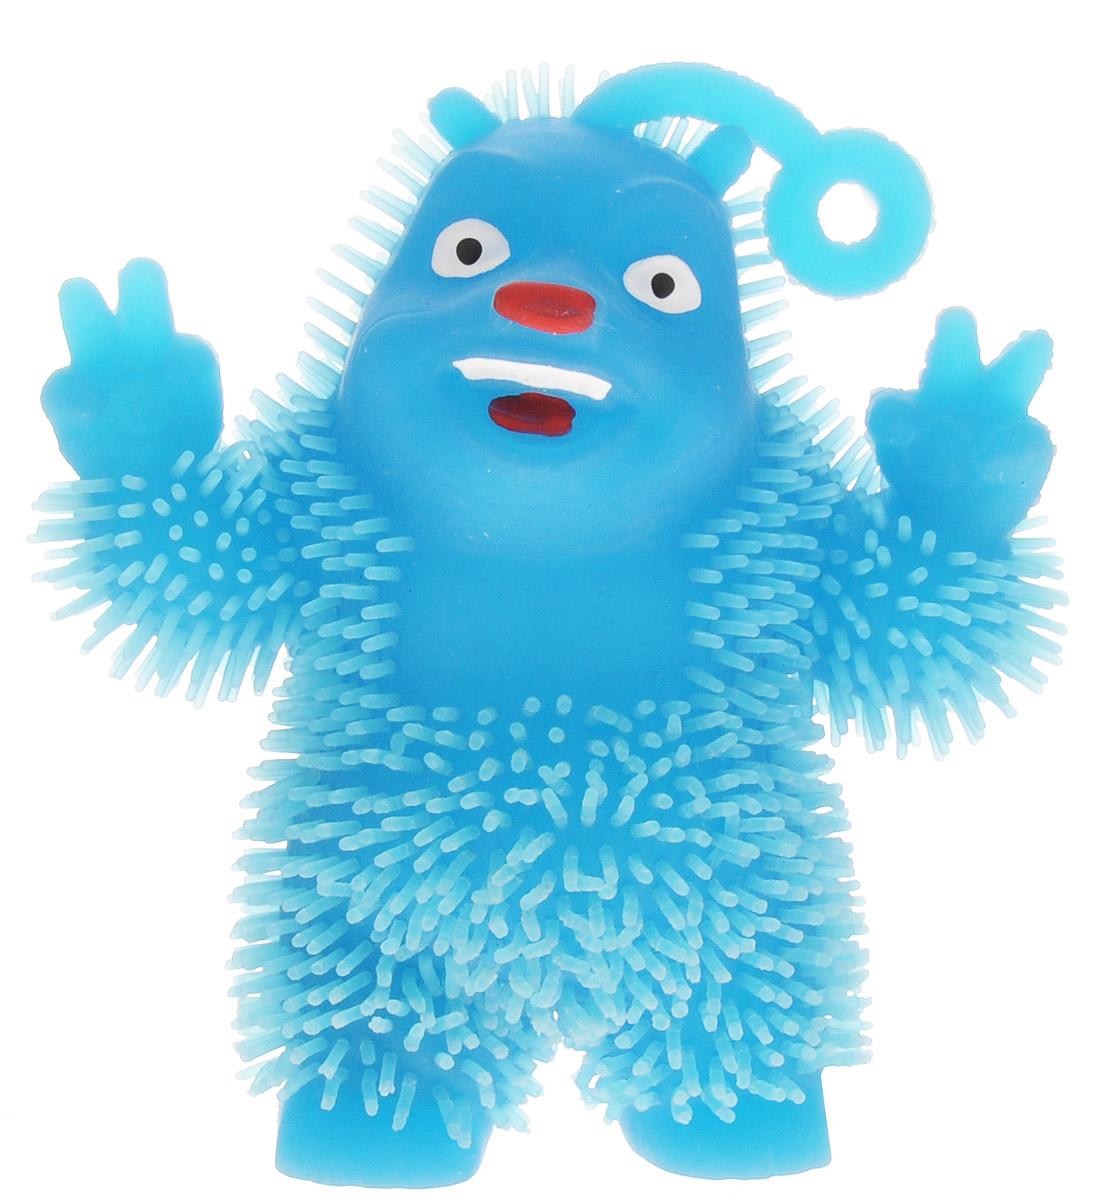 1TOY Игрушка-антистресс Ё-Ёжик Медвежонок-хиппи цвет голубой